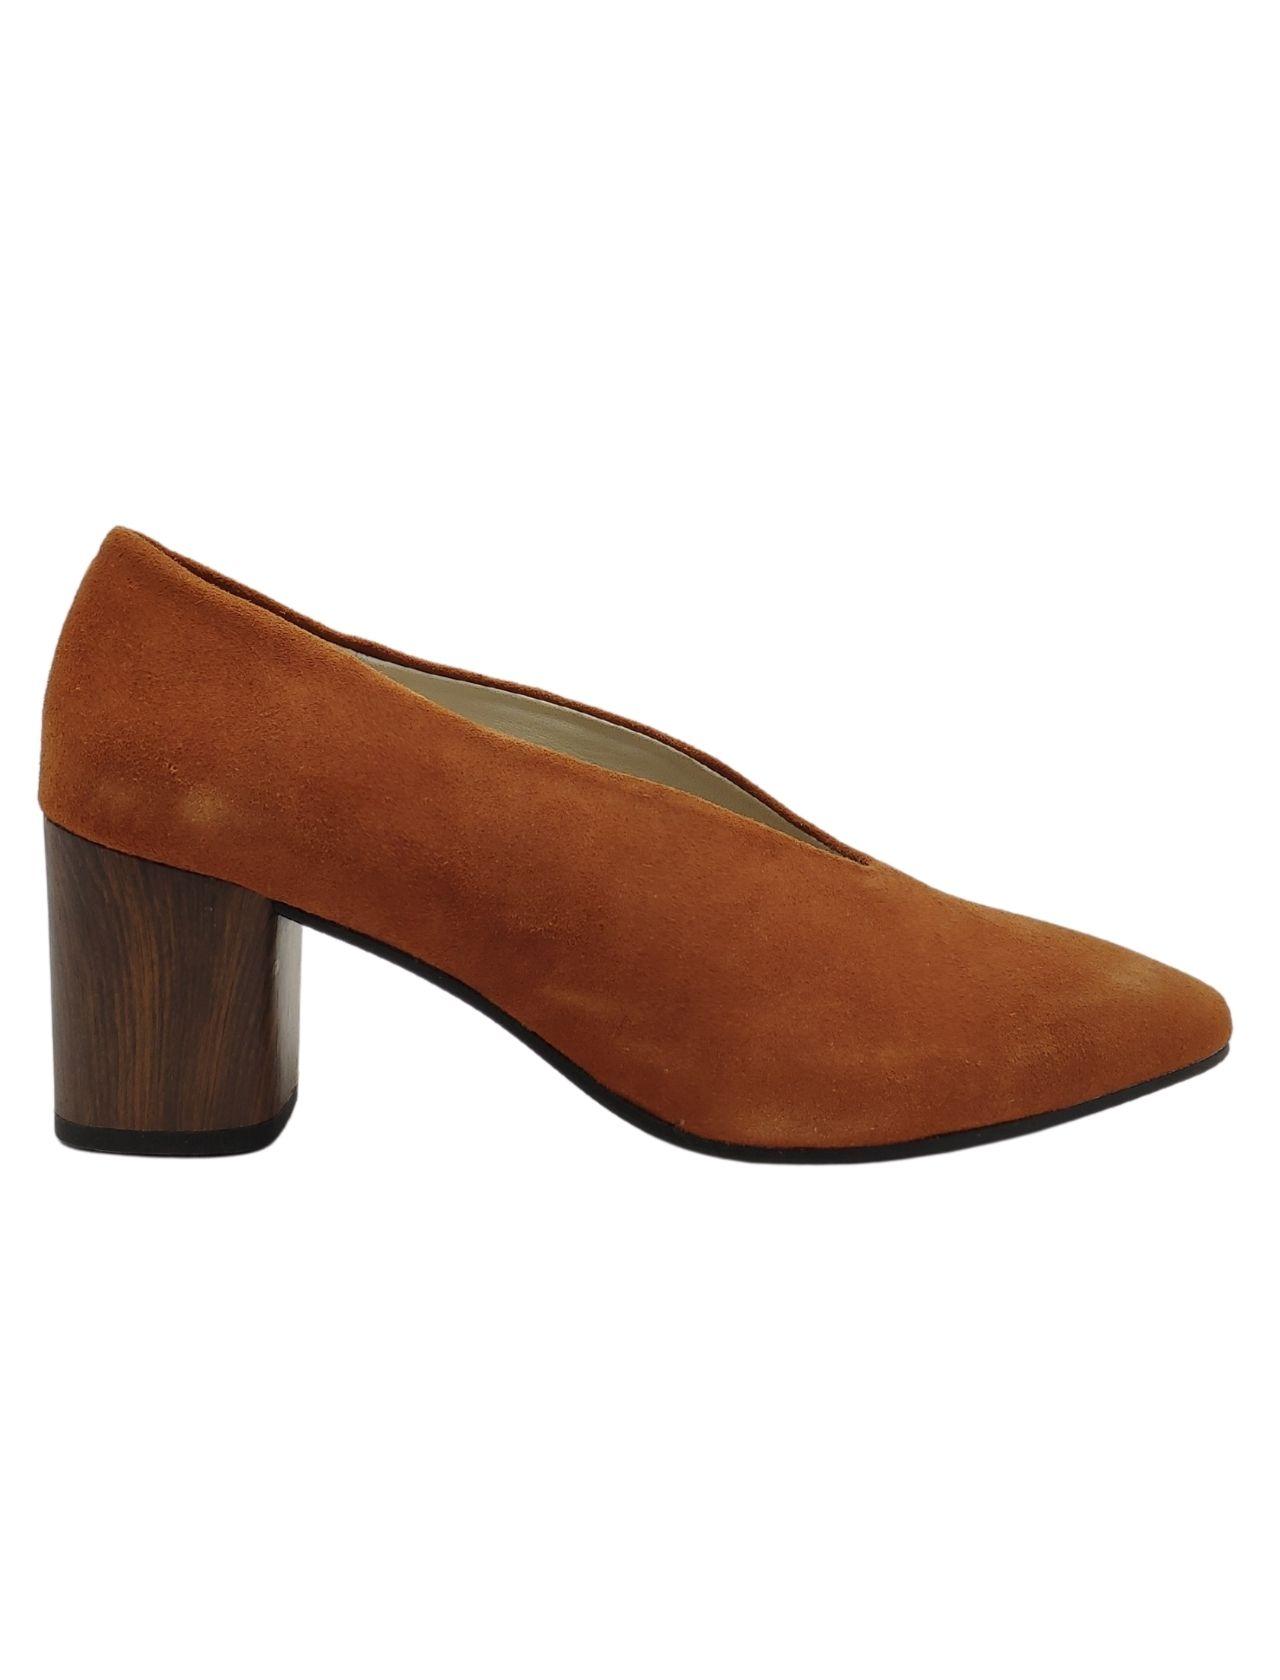 Women's High Heel Décolleté Vagabond | Pumps | 4510RUGGINE